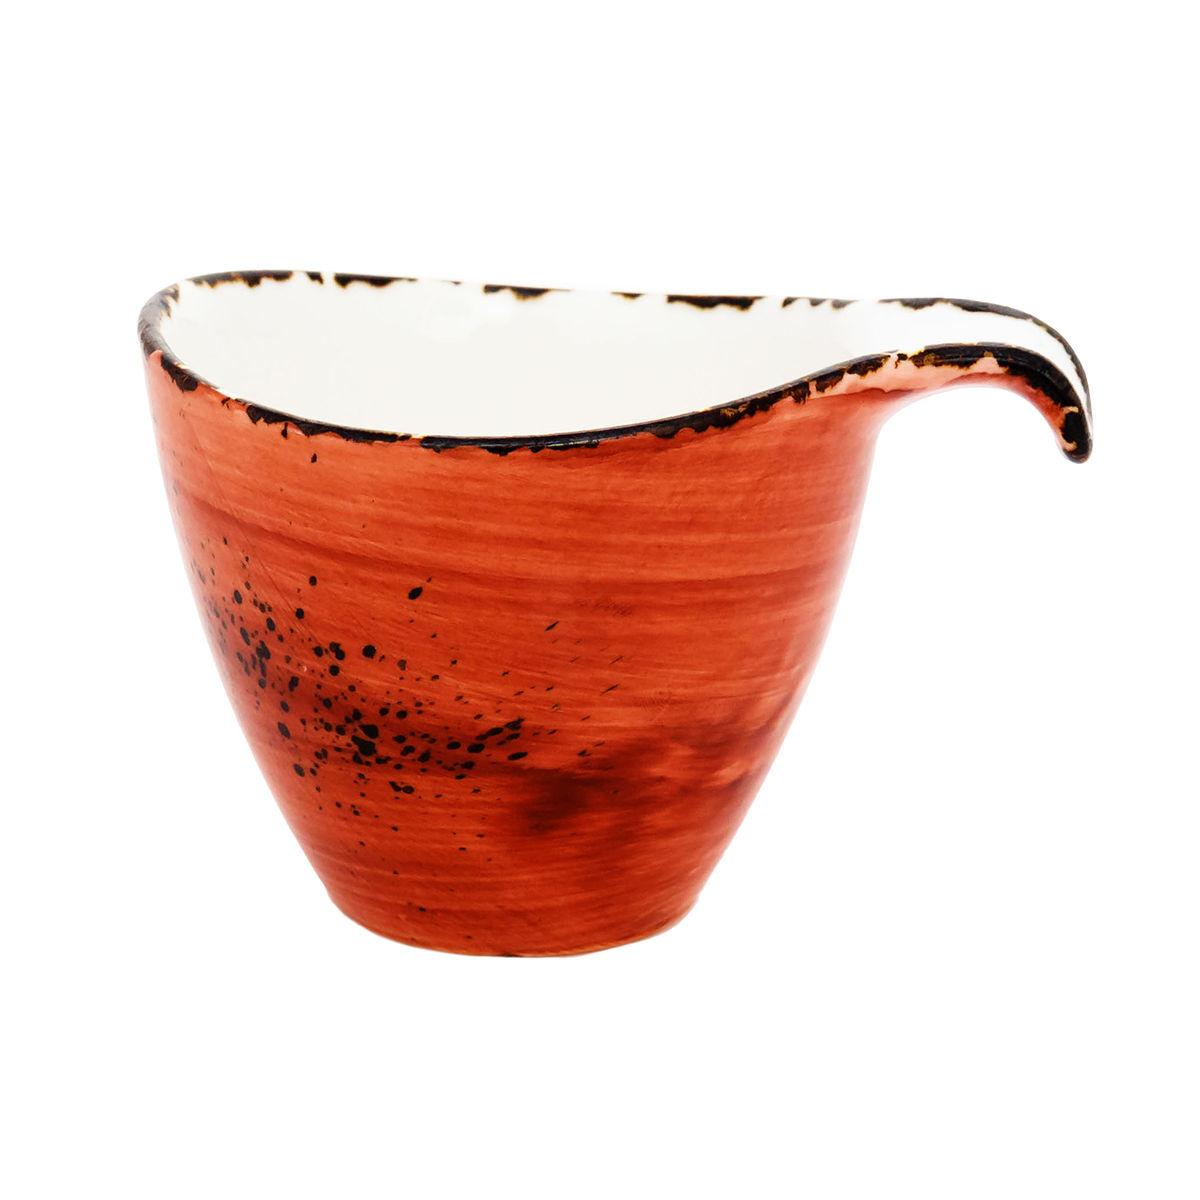 Andaluz Ceasca Portelan Cafea 180 Ml 2021 aranjareamesei.ro